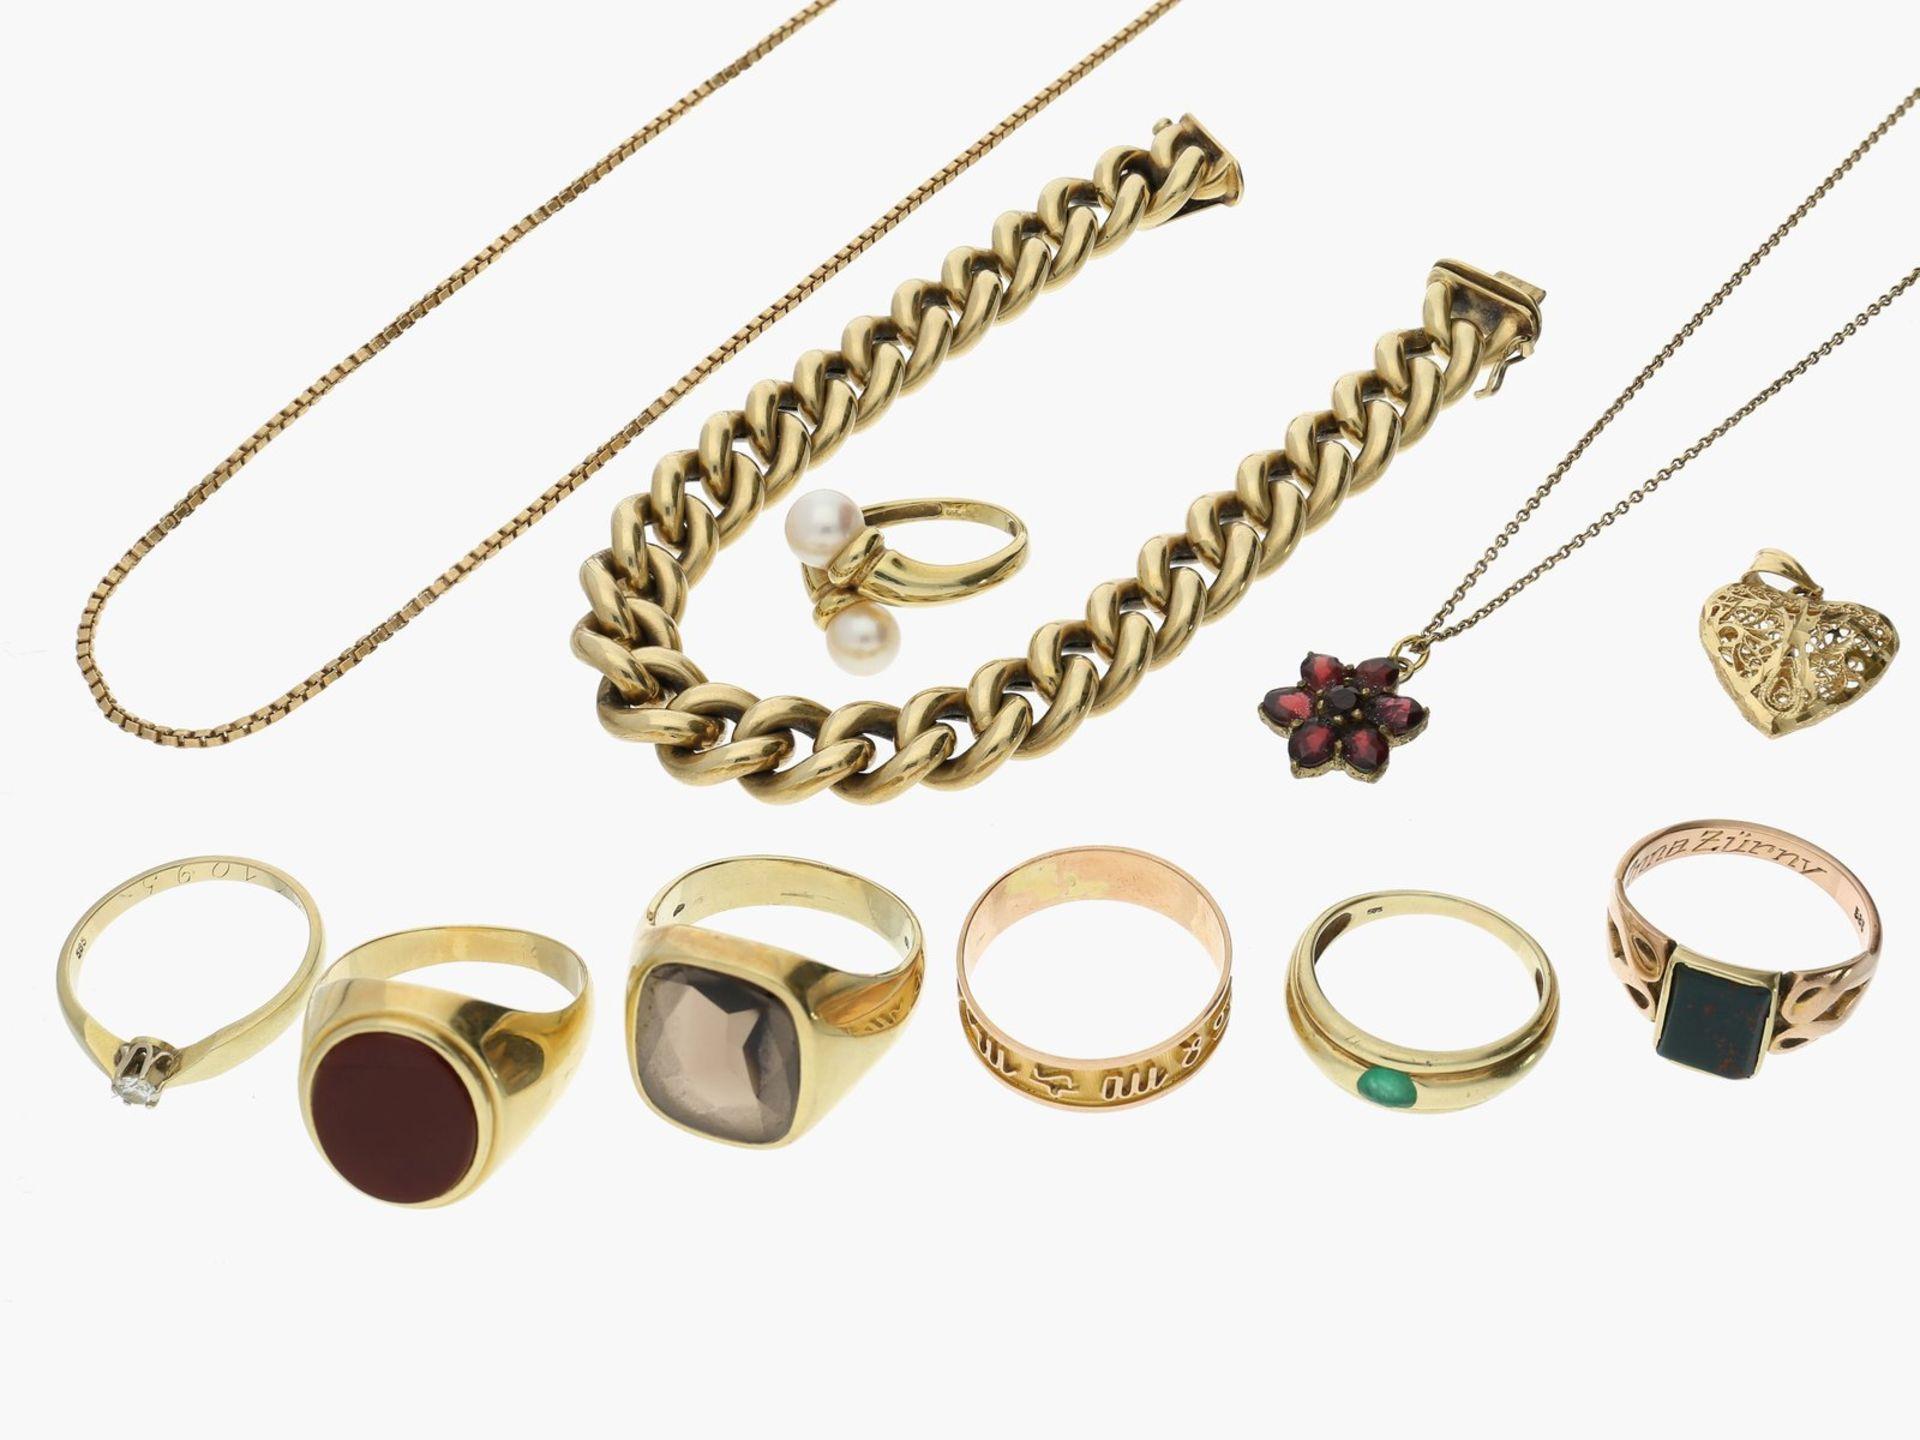 Ring/Anhänger/Armband/Kette: Konvolut vintage Goldschmuck, 14K Gold Konvolut bestehend aus 7